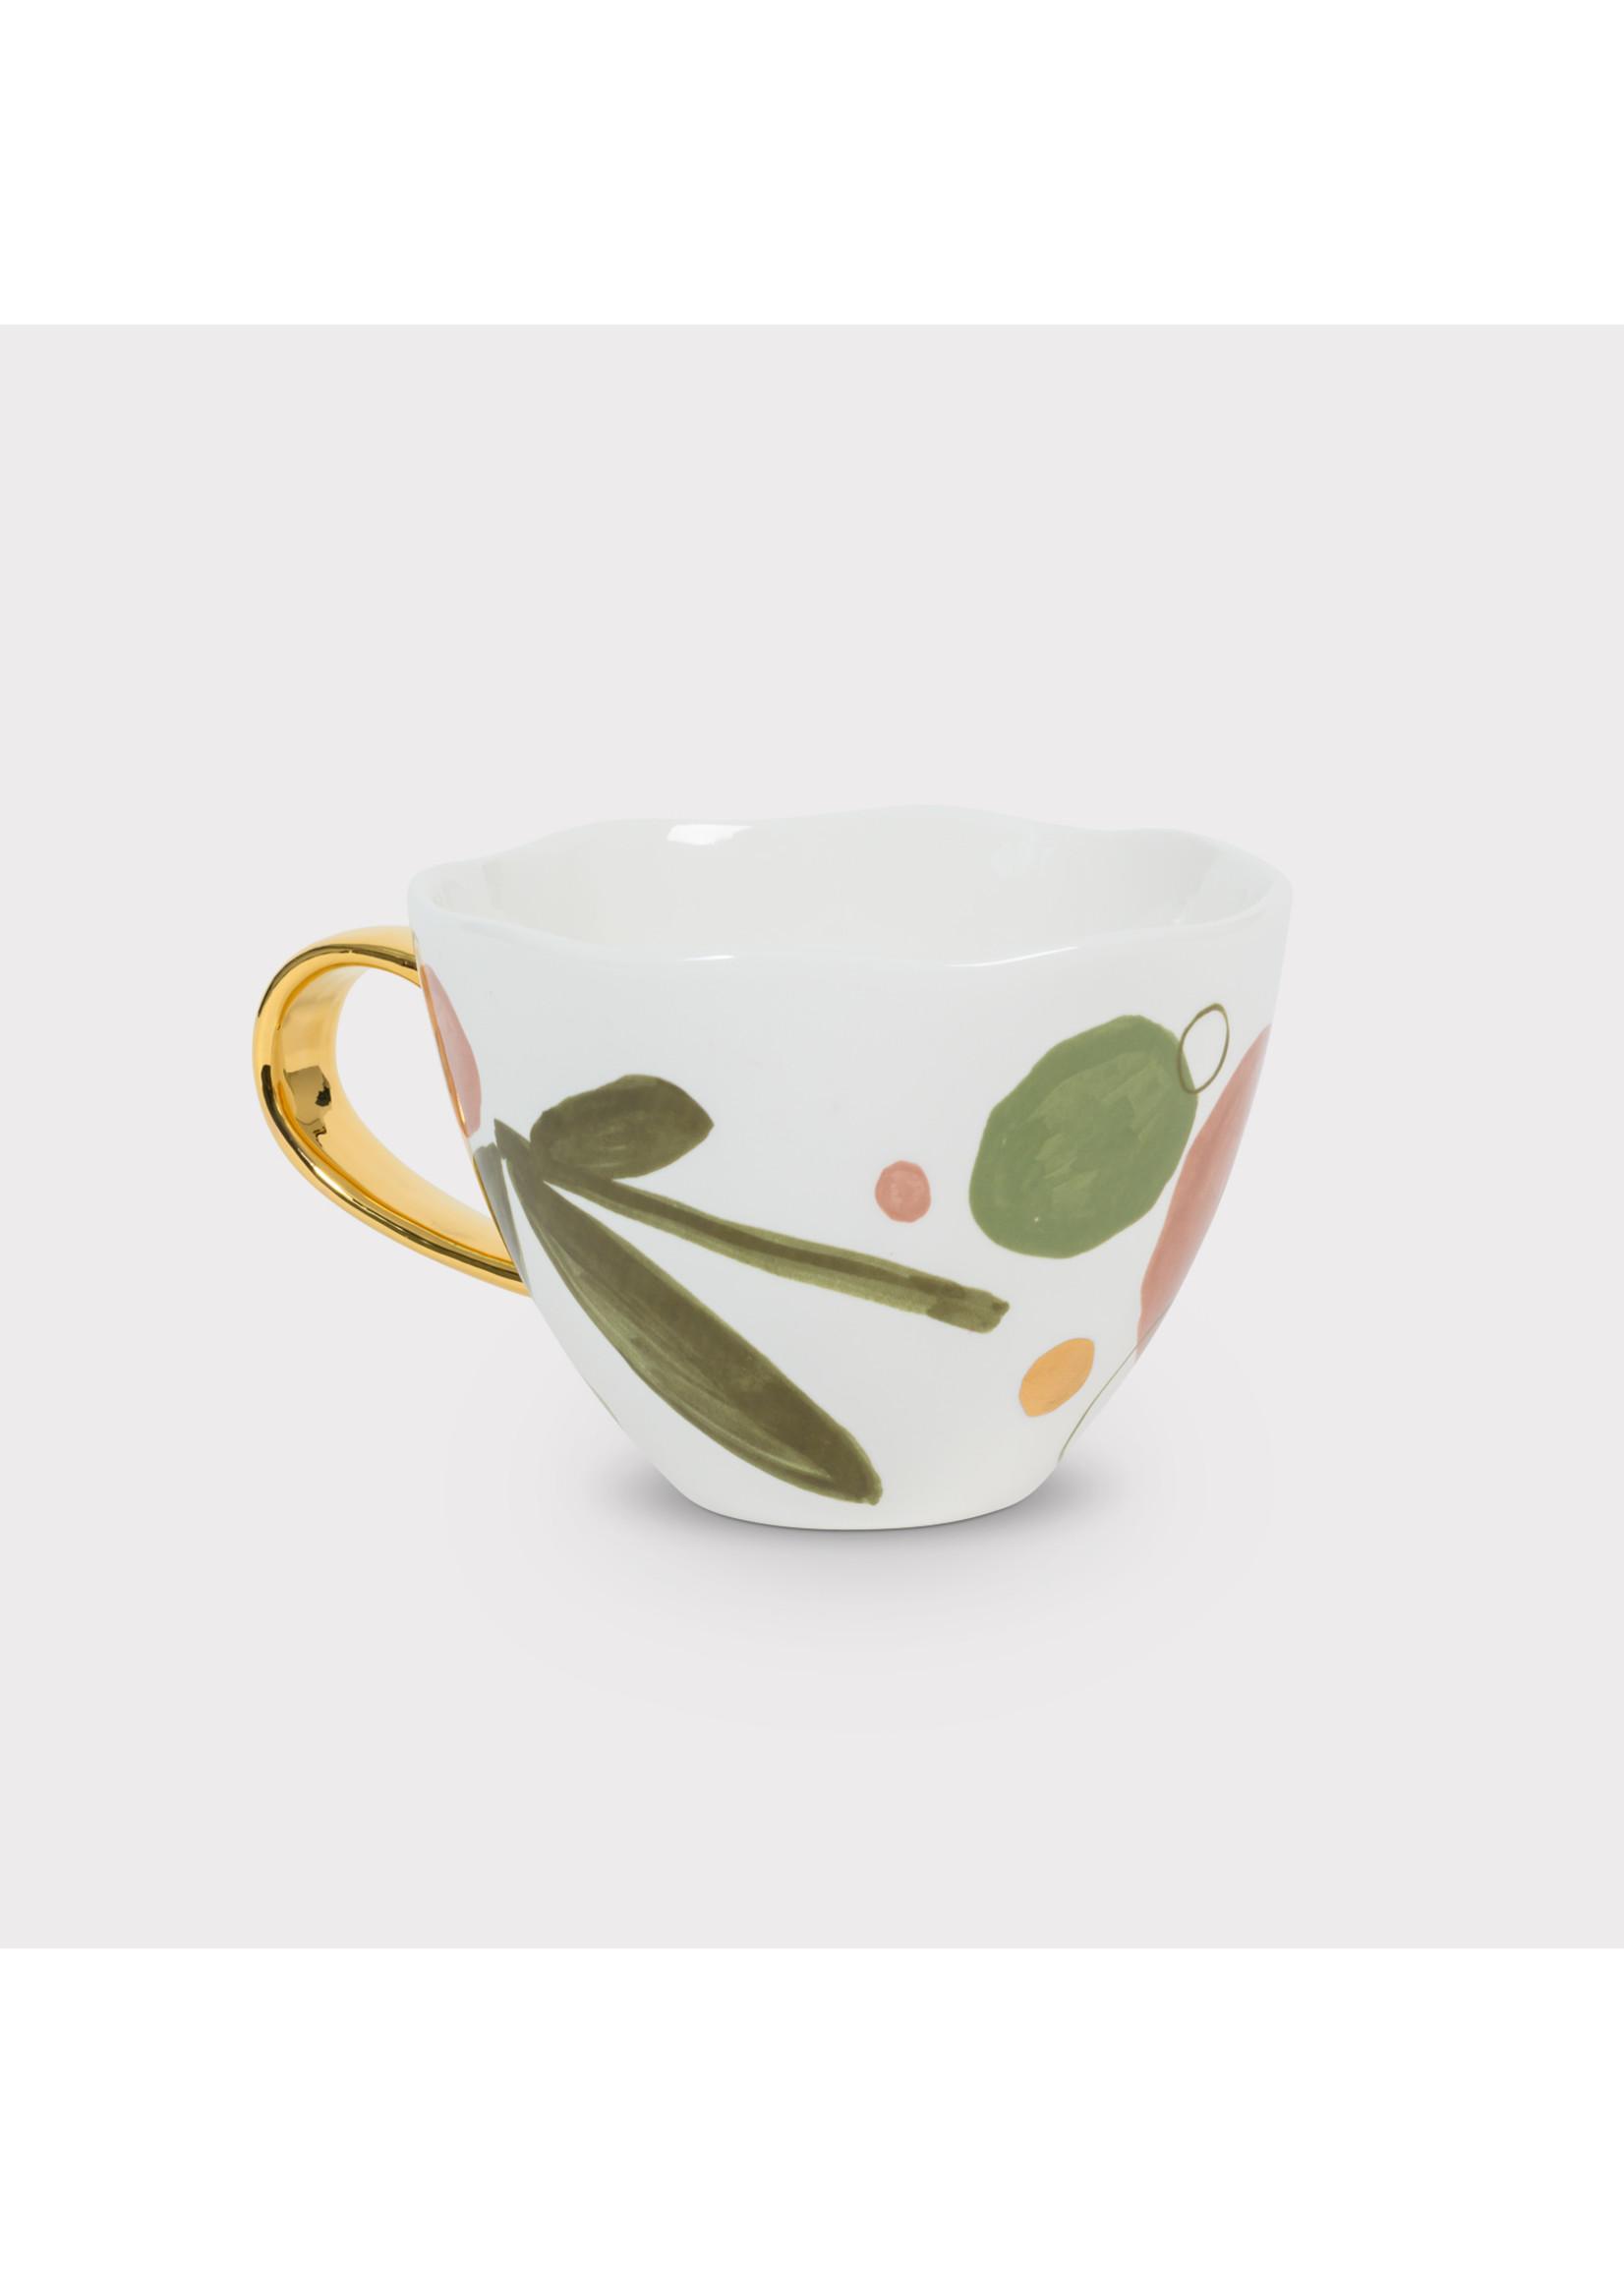 Urban Nature Culture Good Morning cup expressive